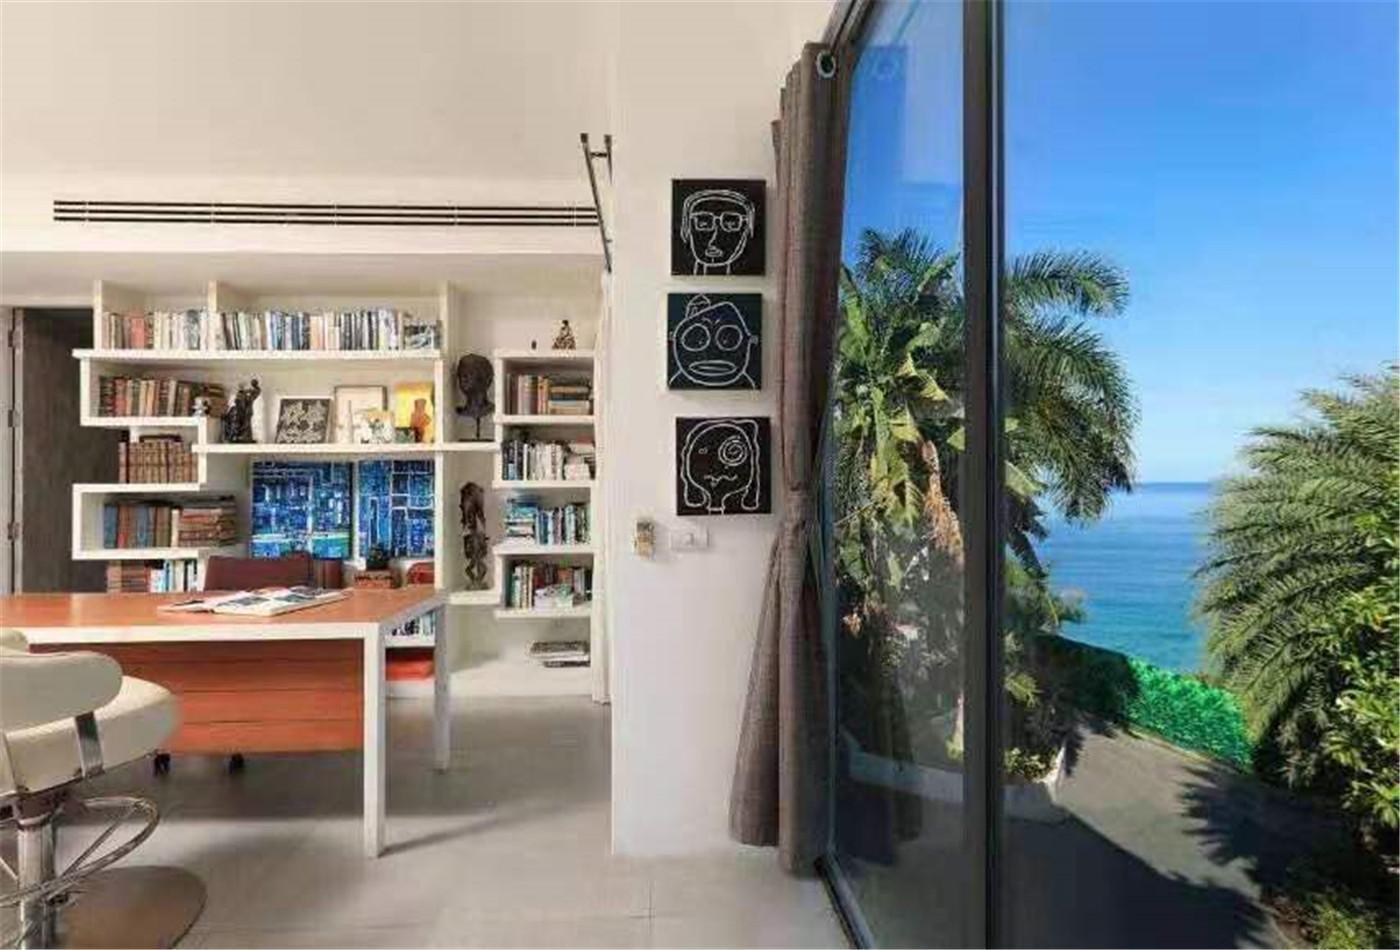 Surin Beach 2bedrooms seaview pool villa วิลลา 2 ห้องนอน 2 ห้องน้ำส่วนตัว ขนาด 400 ตร.ม. – สุรินทร์